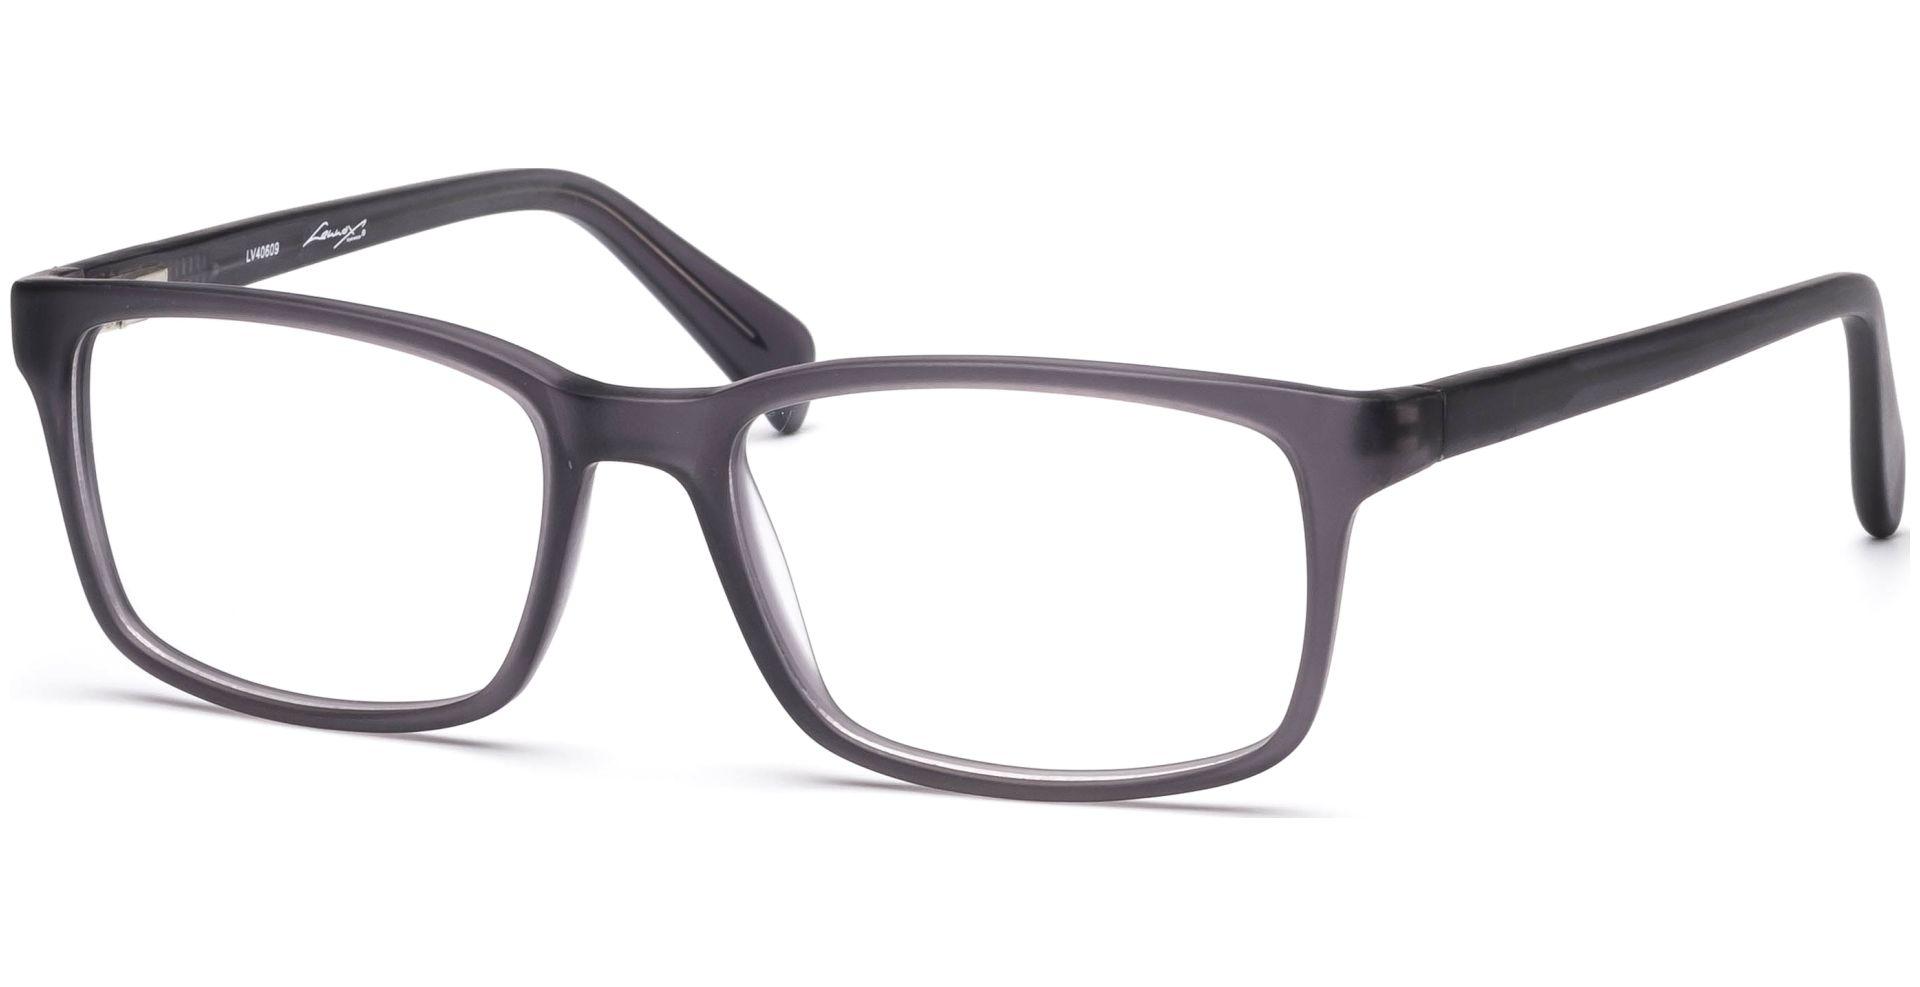 Lennox Eyewear - Evert 5518 grau matt - von Lensbest